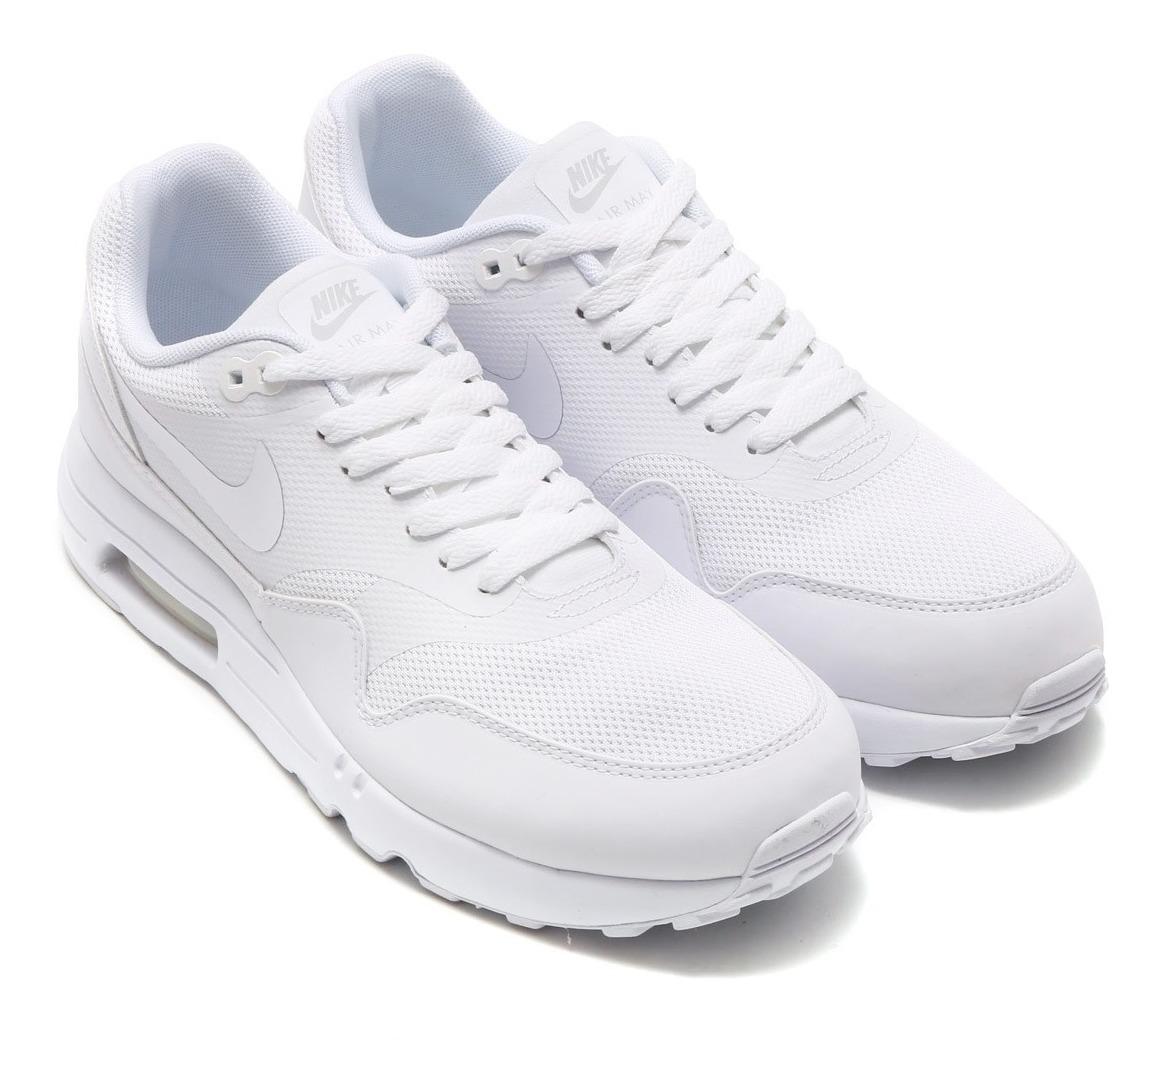 Tenis Casual Nike Air Max 1 Ultra 2.0 Blanco Envío Gratis